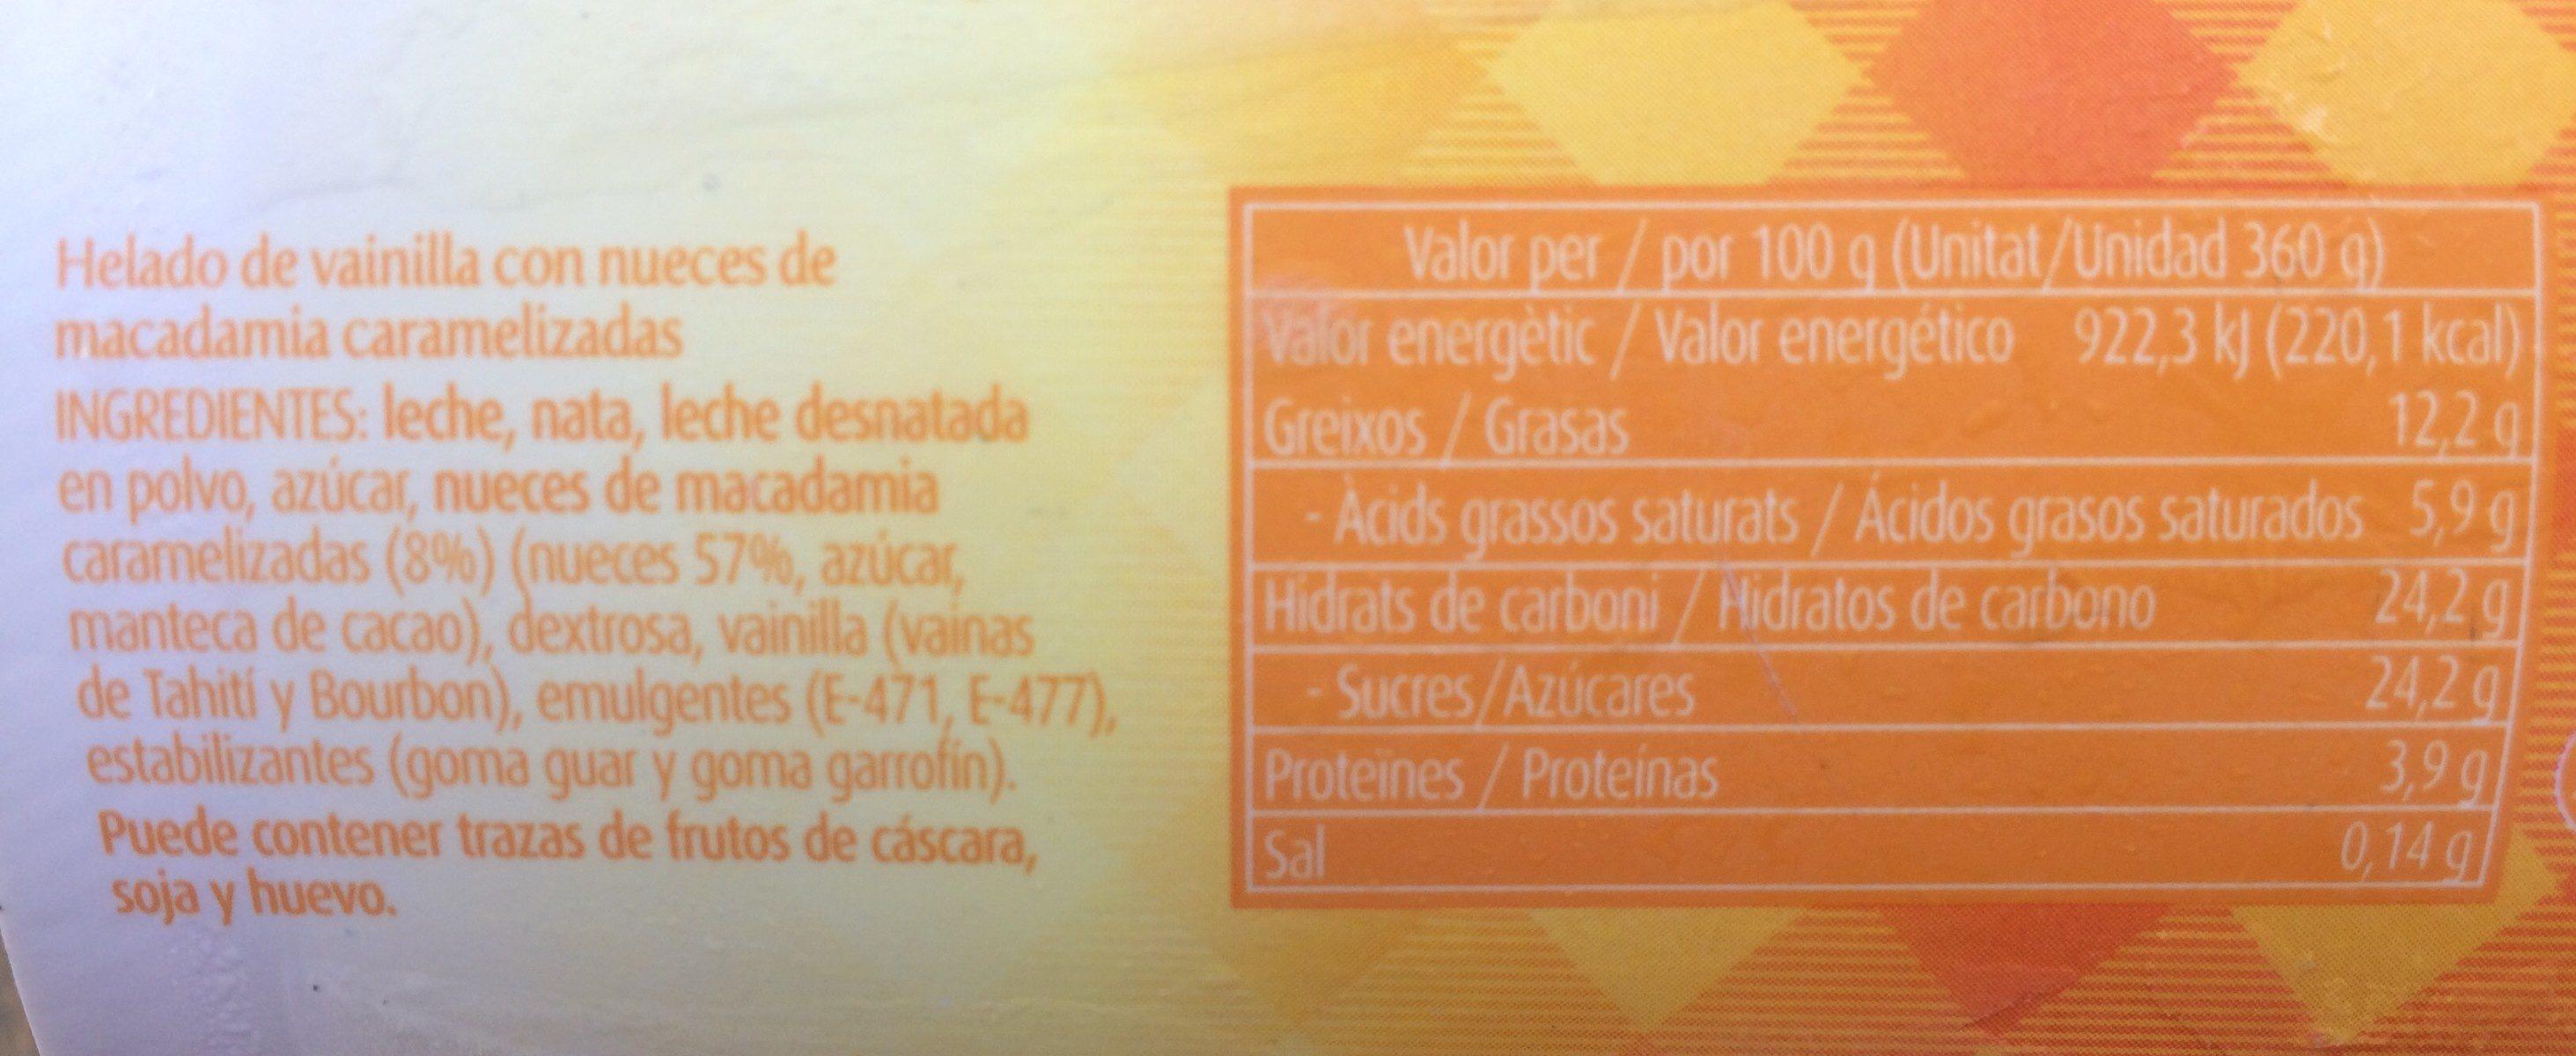 Gelat de vainilla amb nous de macadamia - Ingrédients - fr